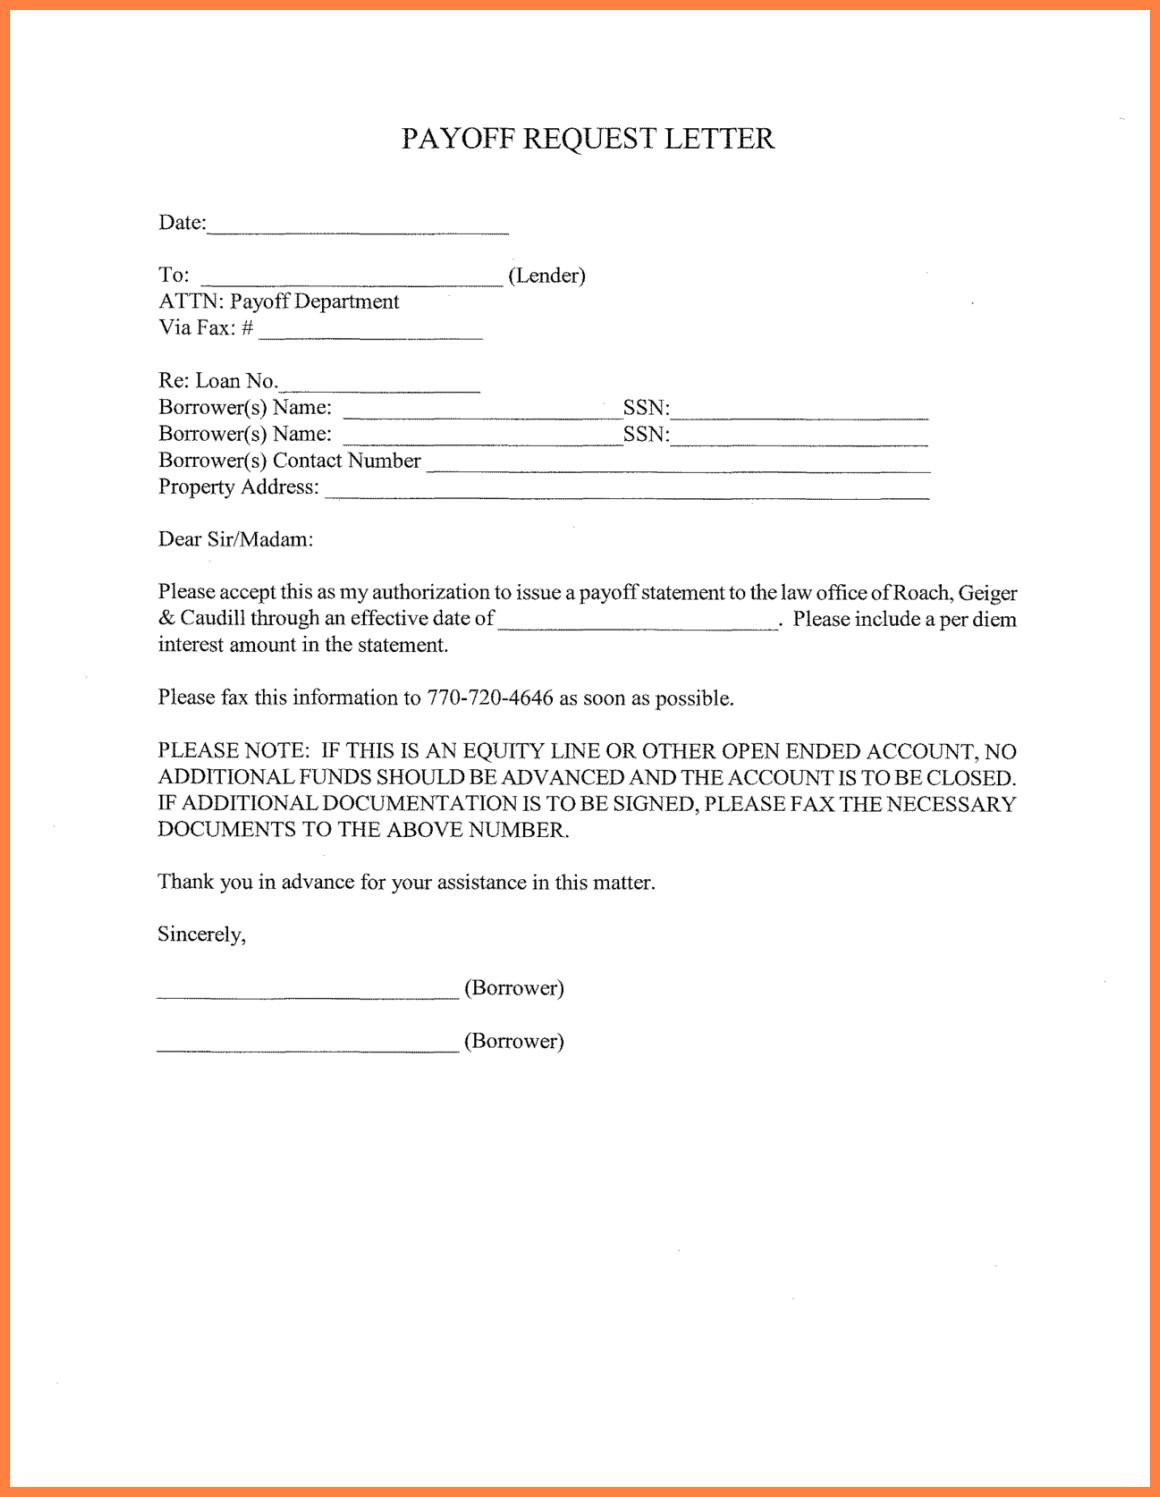 Salary deposit letter format statement sample template pzjqcp salary deposit letter format statement sample template pzjqcp authorization for immigration visa alramifo Gallery